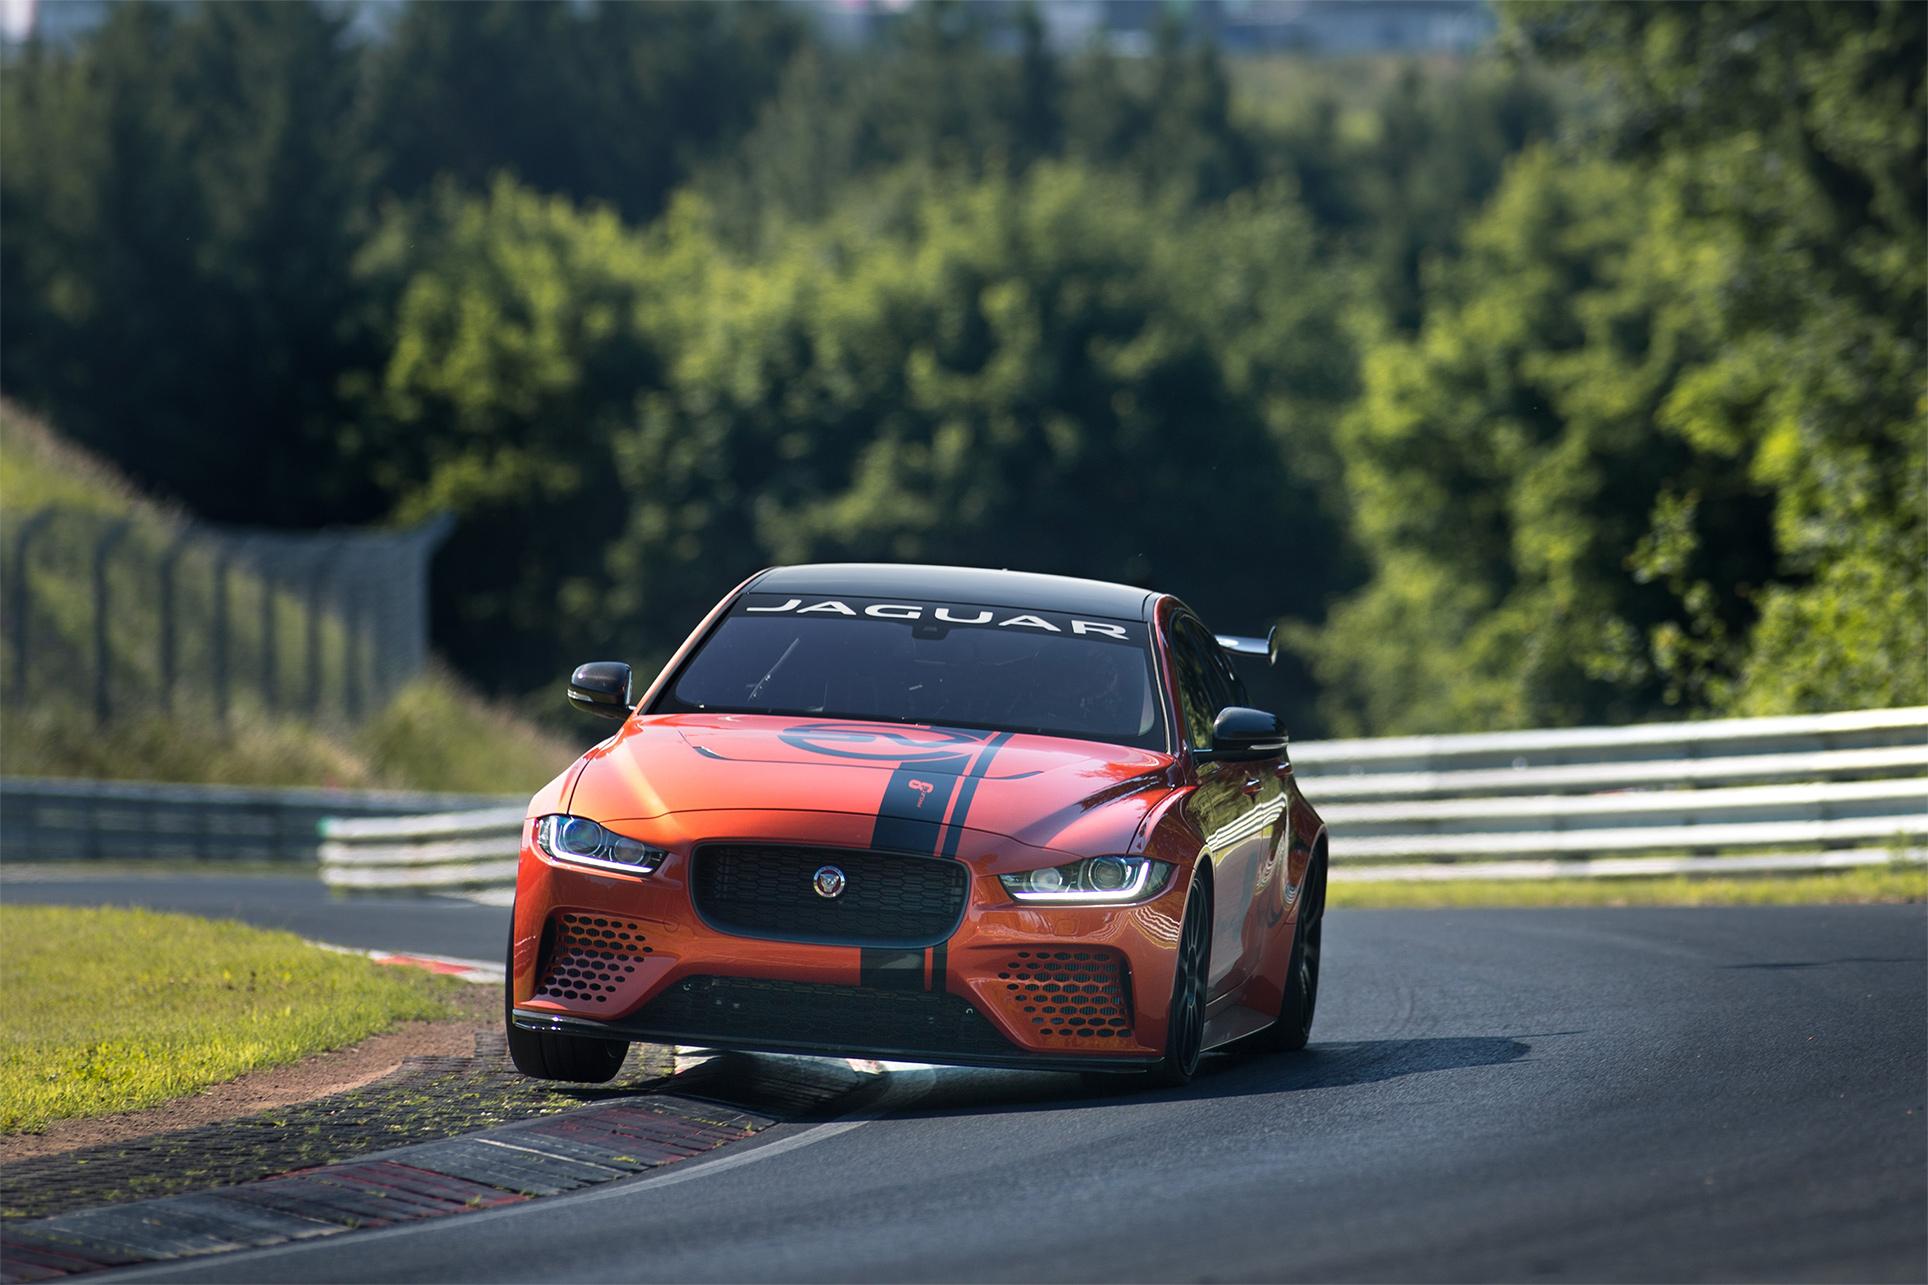 TrackWorthy - Jaguar XE SV Project 8 (1)